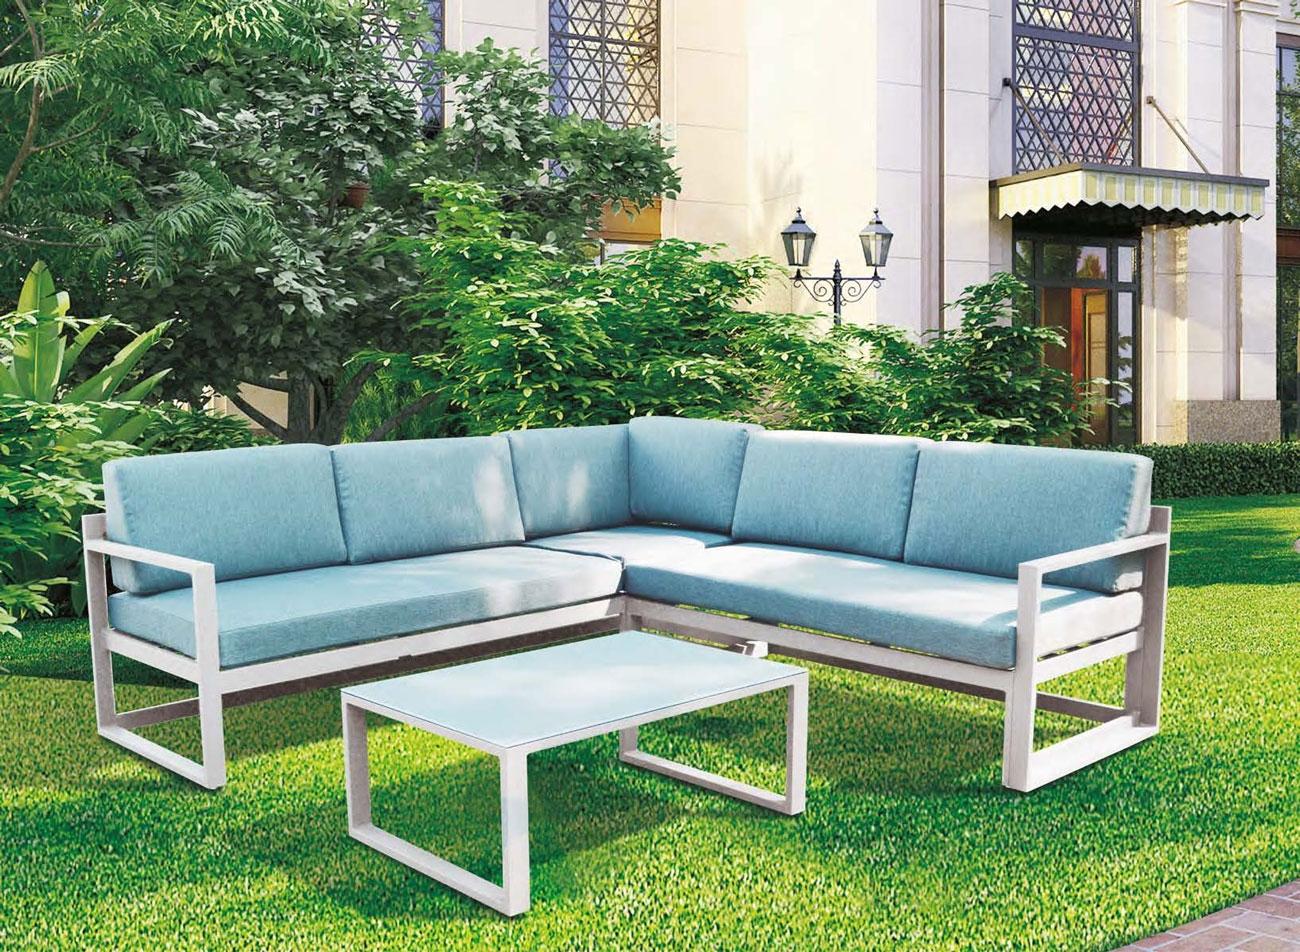 SET SOFA DE EXTERIOR BORNEO - Set para terraza o jardín modelo BORNEO de Majestic Garden color blanco o antracita.